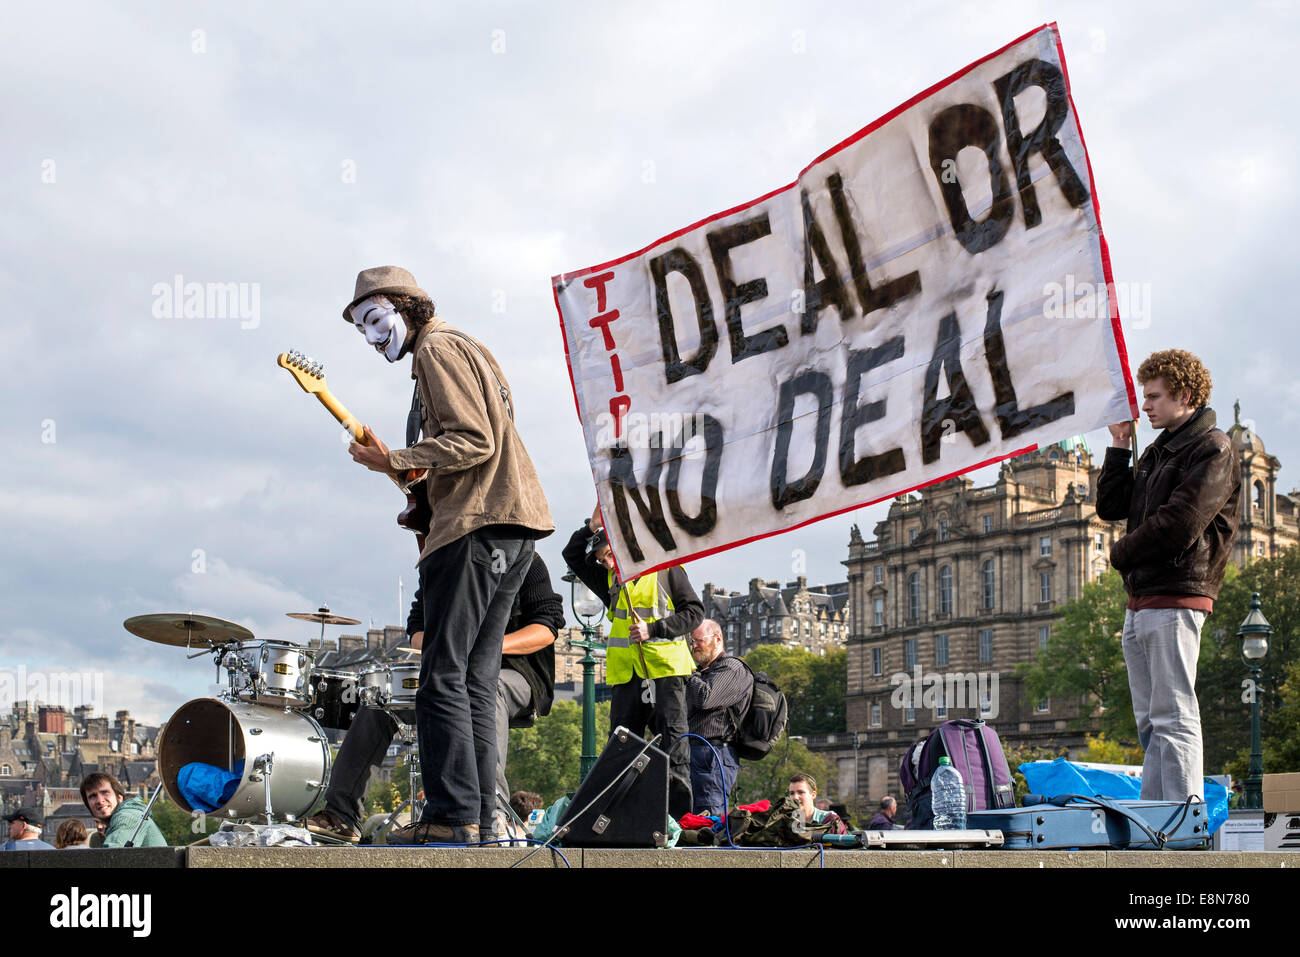 Demonstration in Edinburgh against TTIP, Transatlantic Trade and Investment Partnership. 11th October 2014. - Stock Image